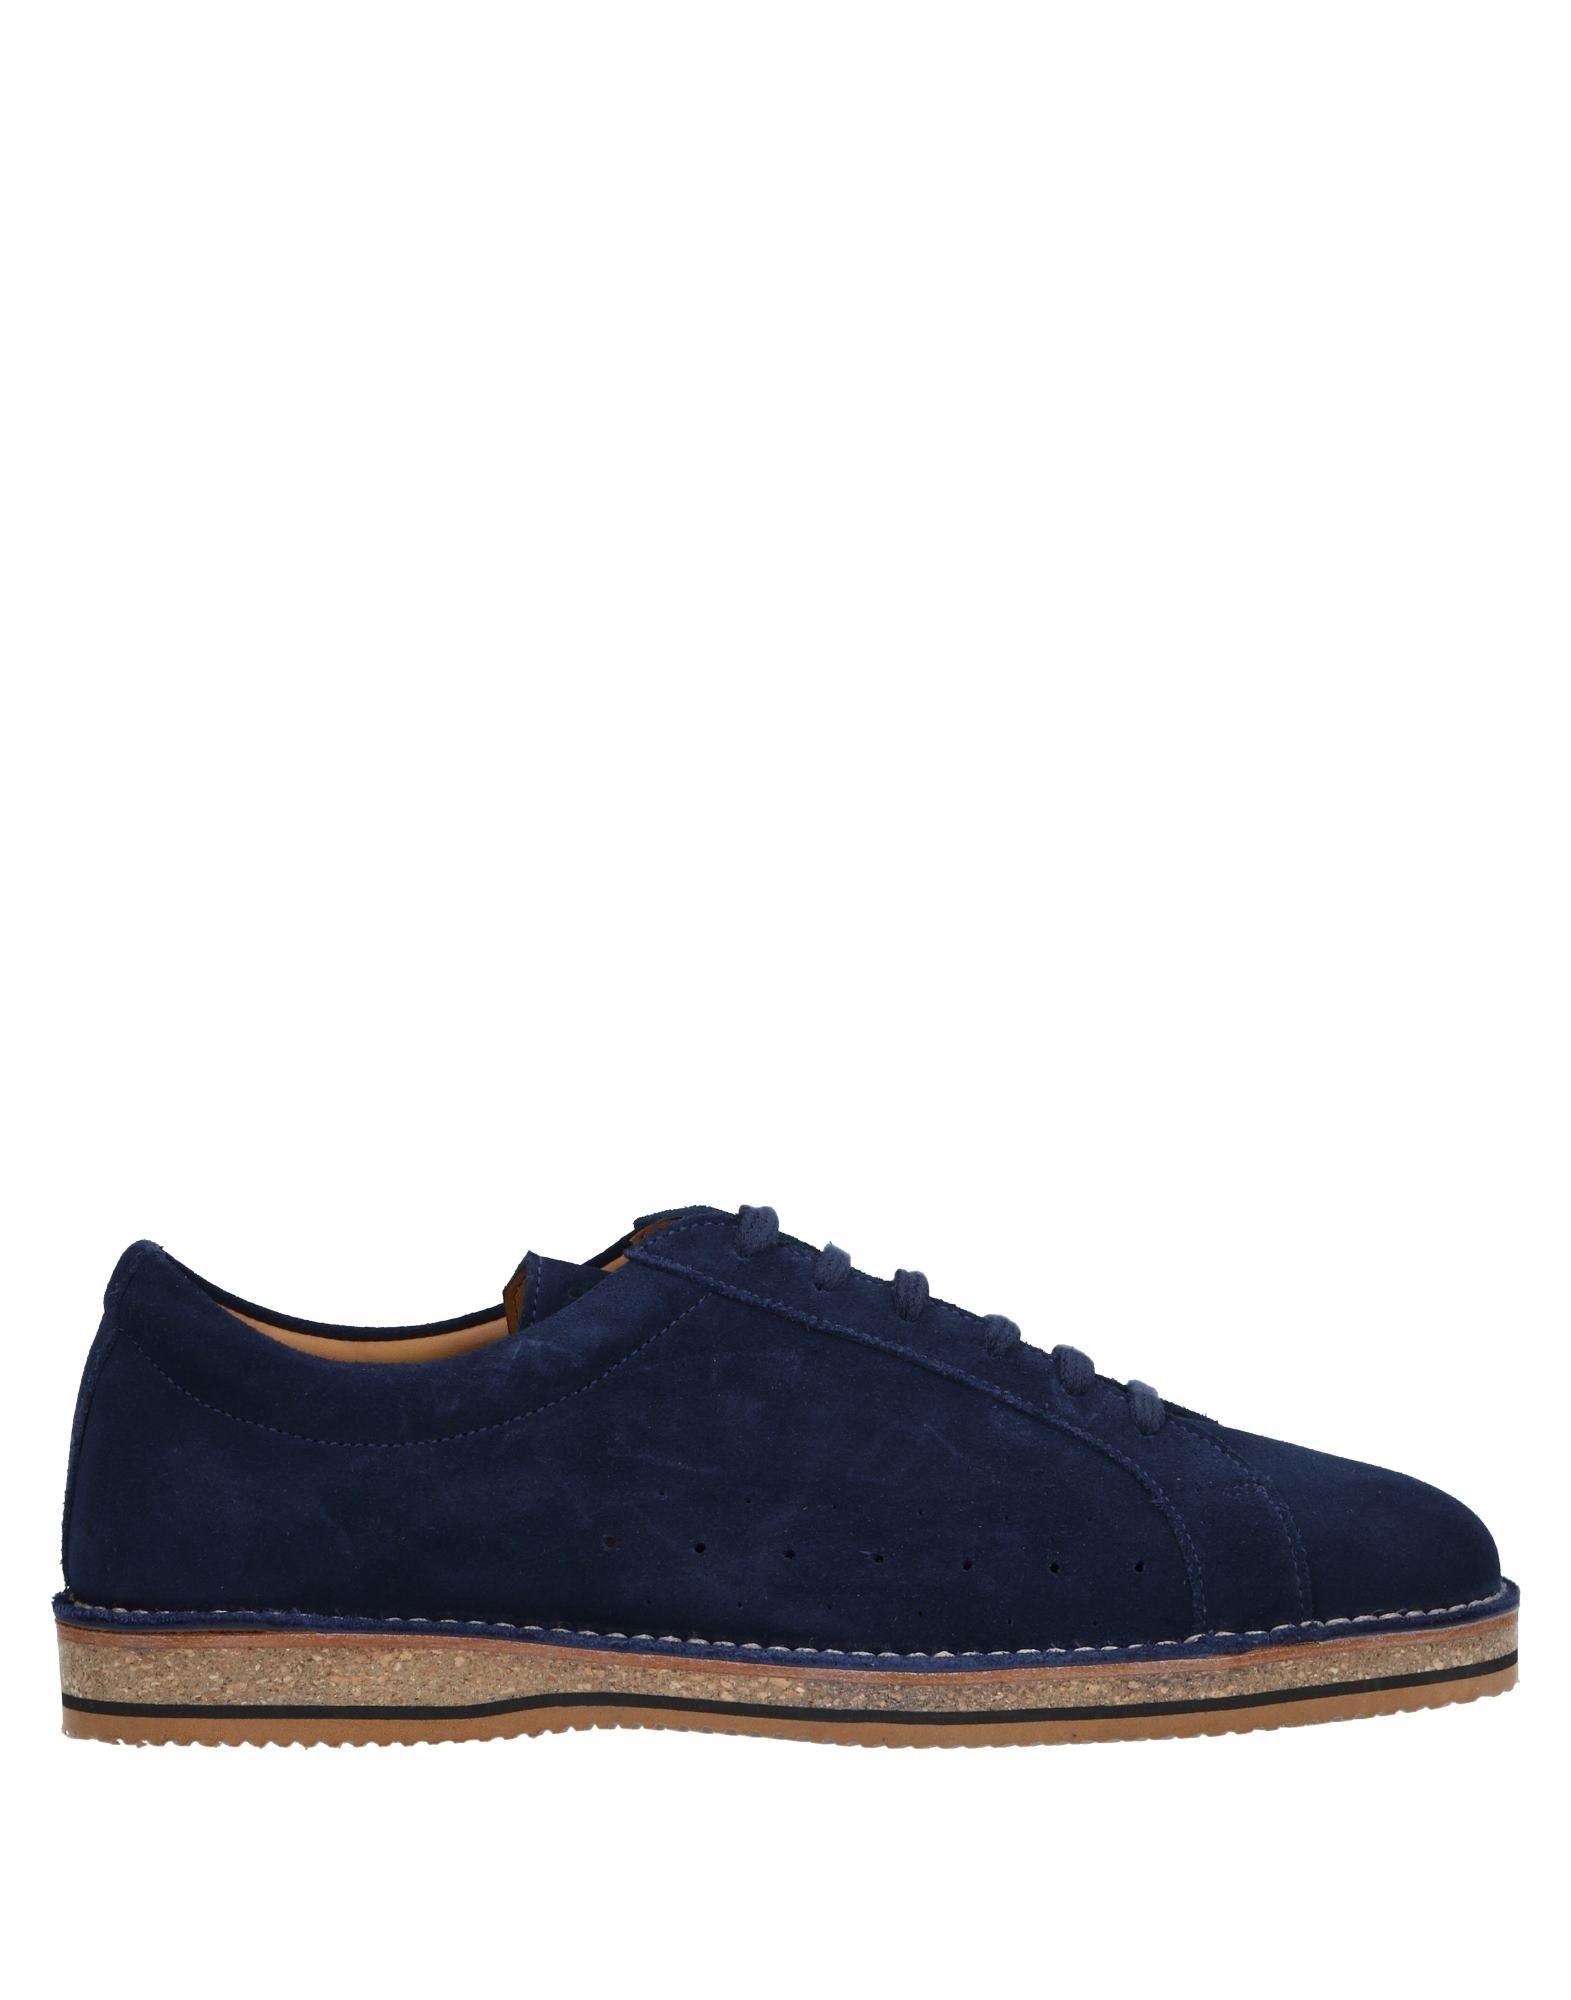 N.D.C. Made By Hand Sneakers Herren  11526080AJ Gute Qualität beliebte Schuhe